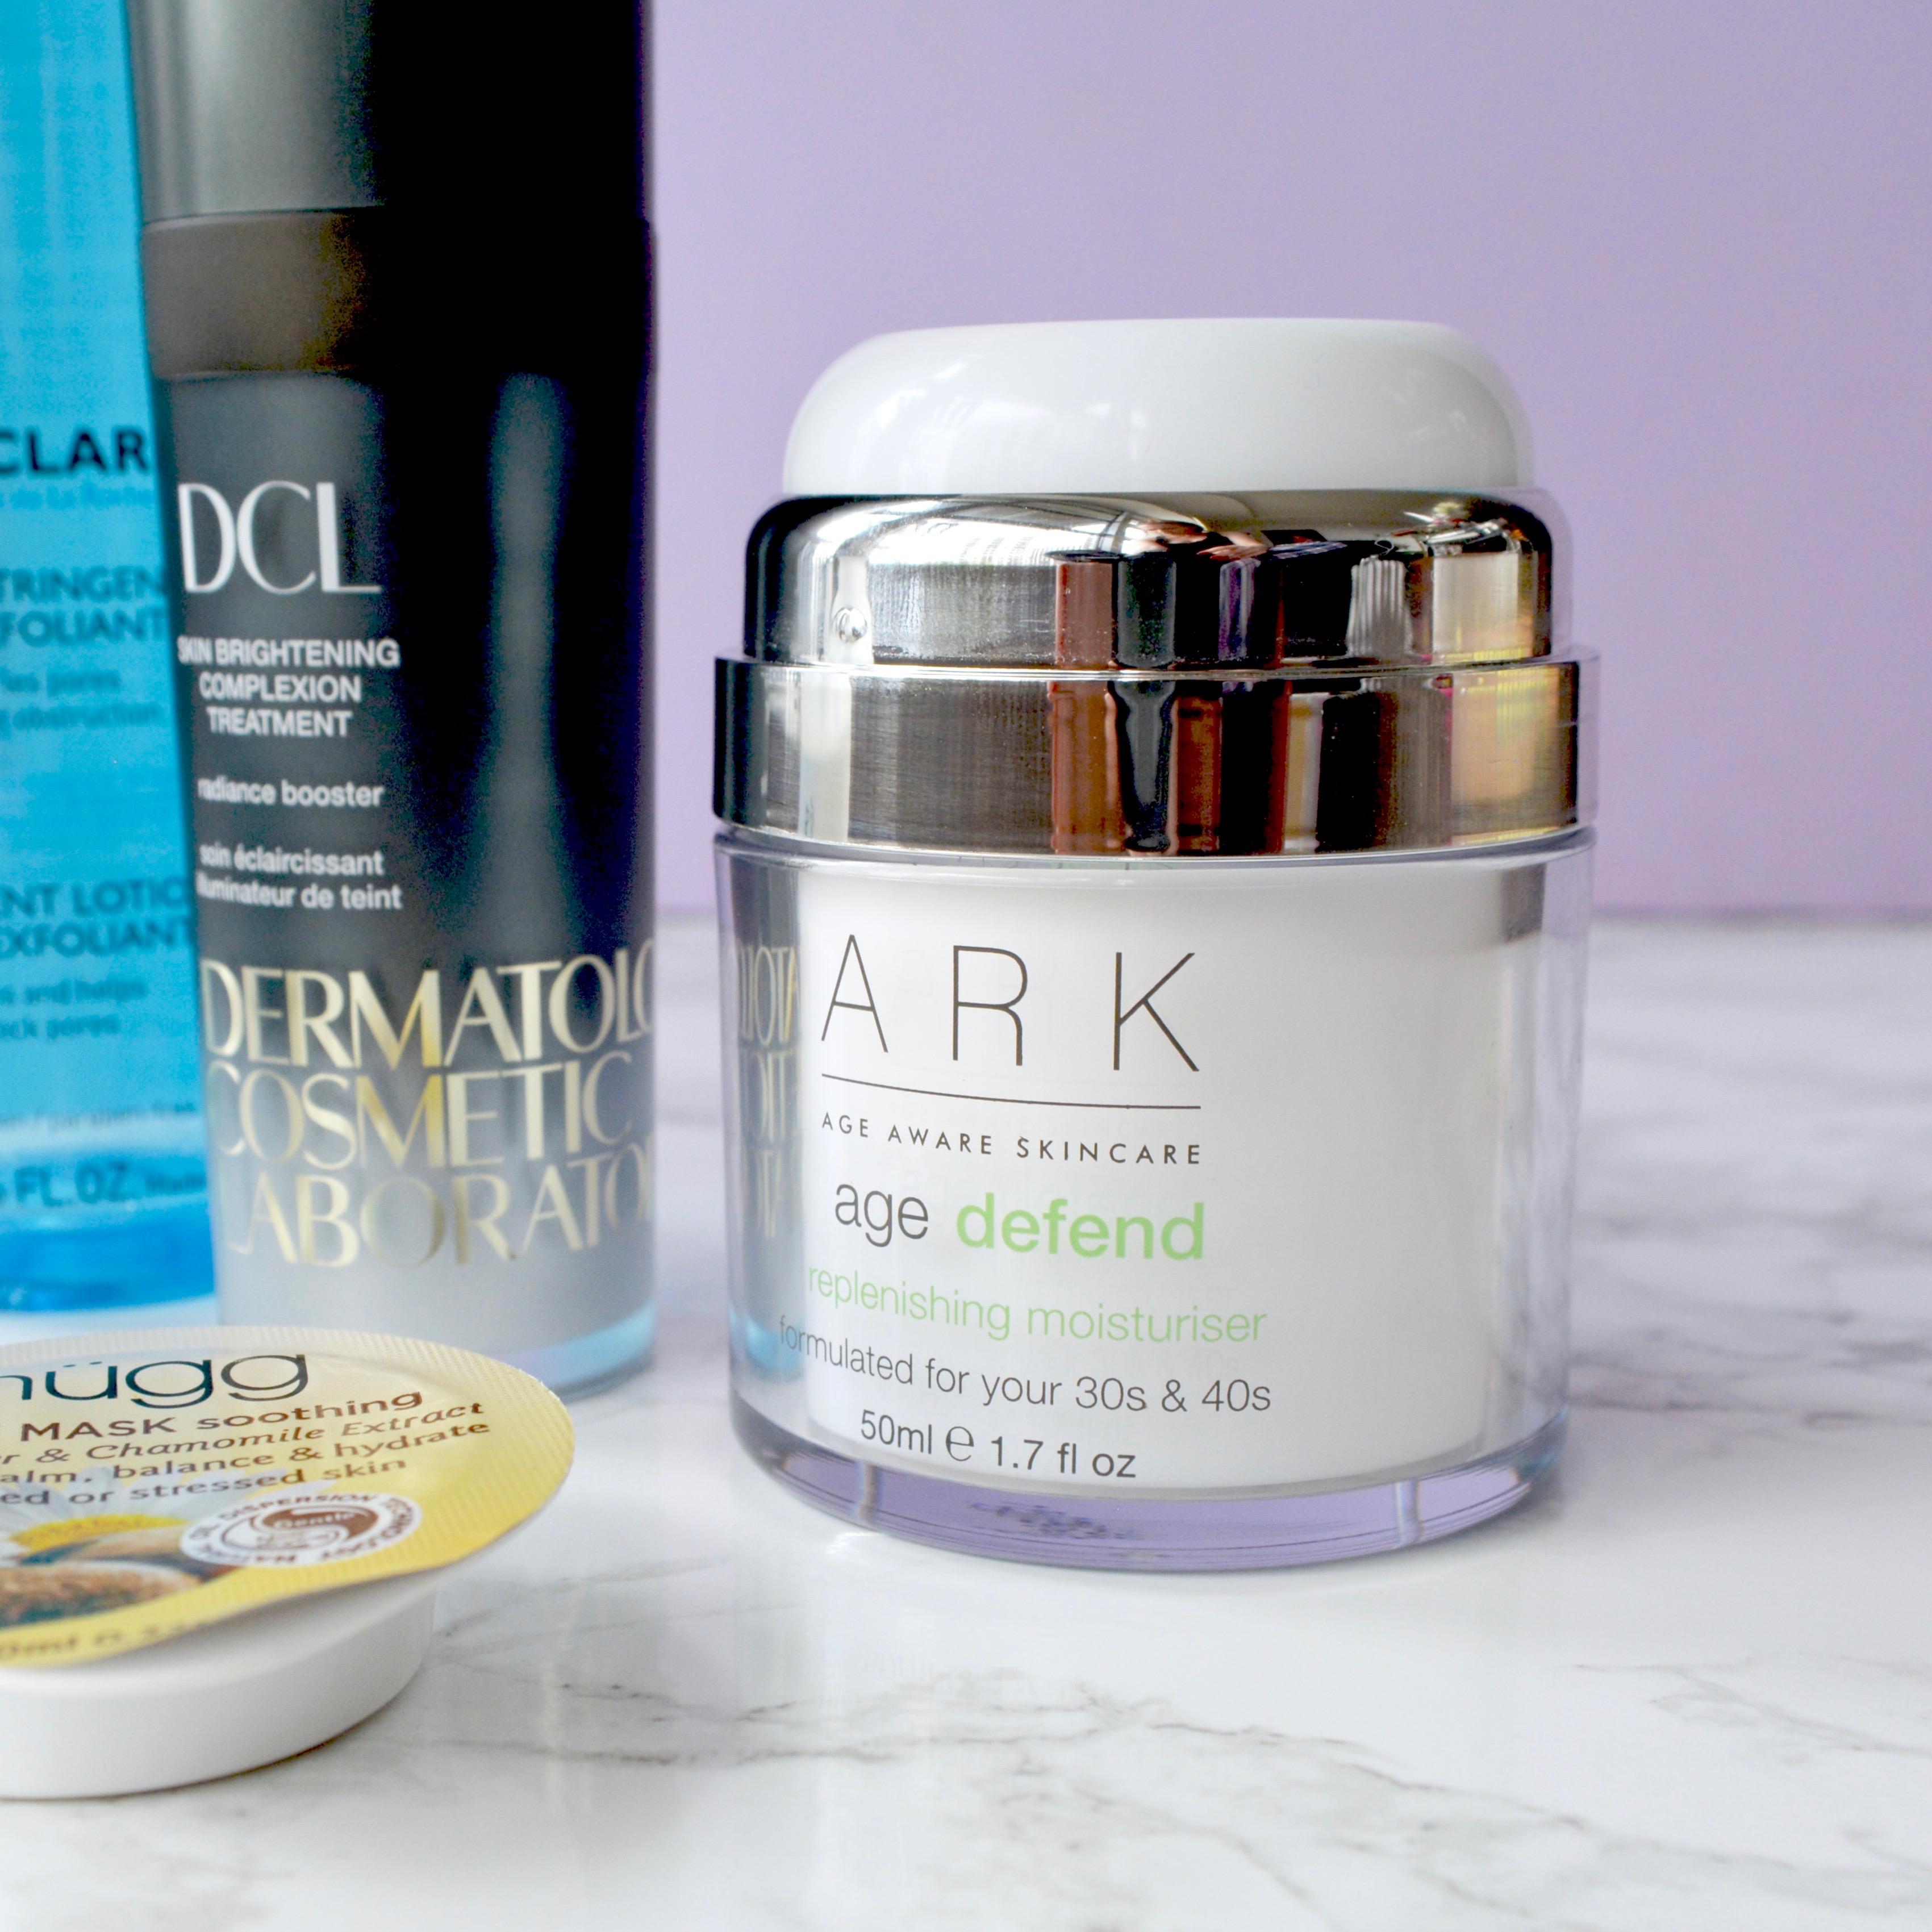 Skincare Shake Up: ARK age defend moisturiser. Great recommendations for rosacea/sensitive skin